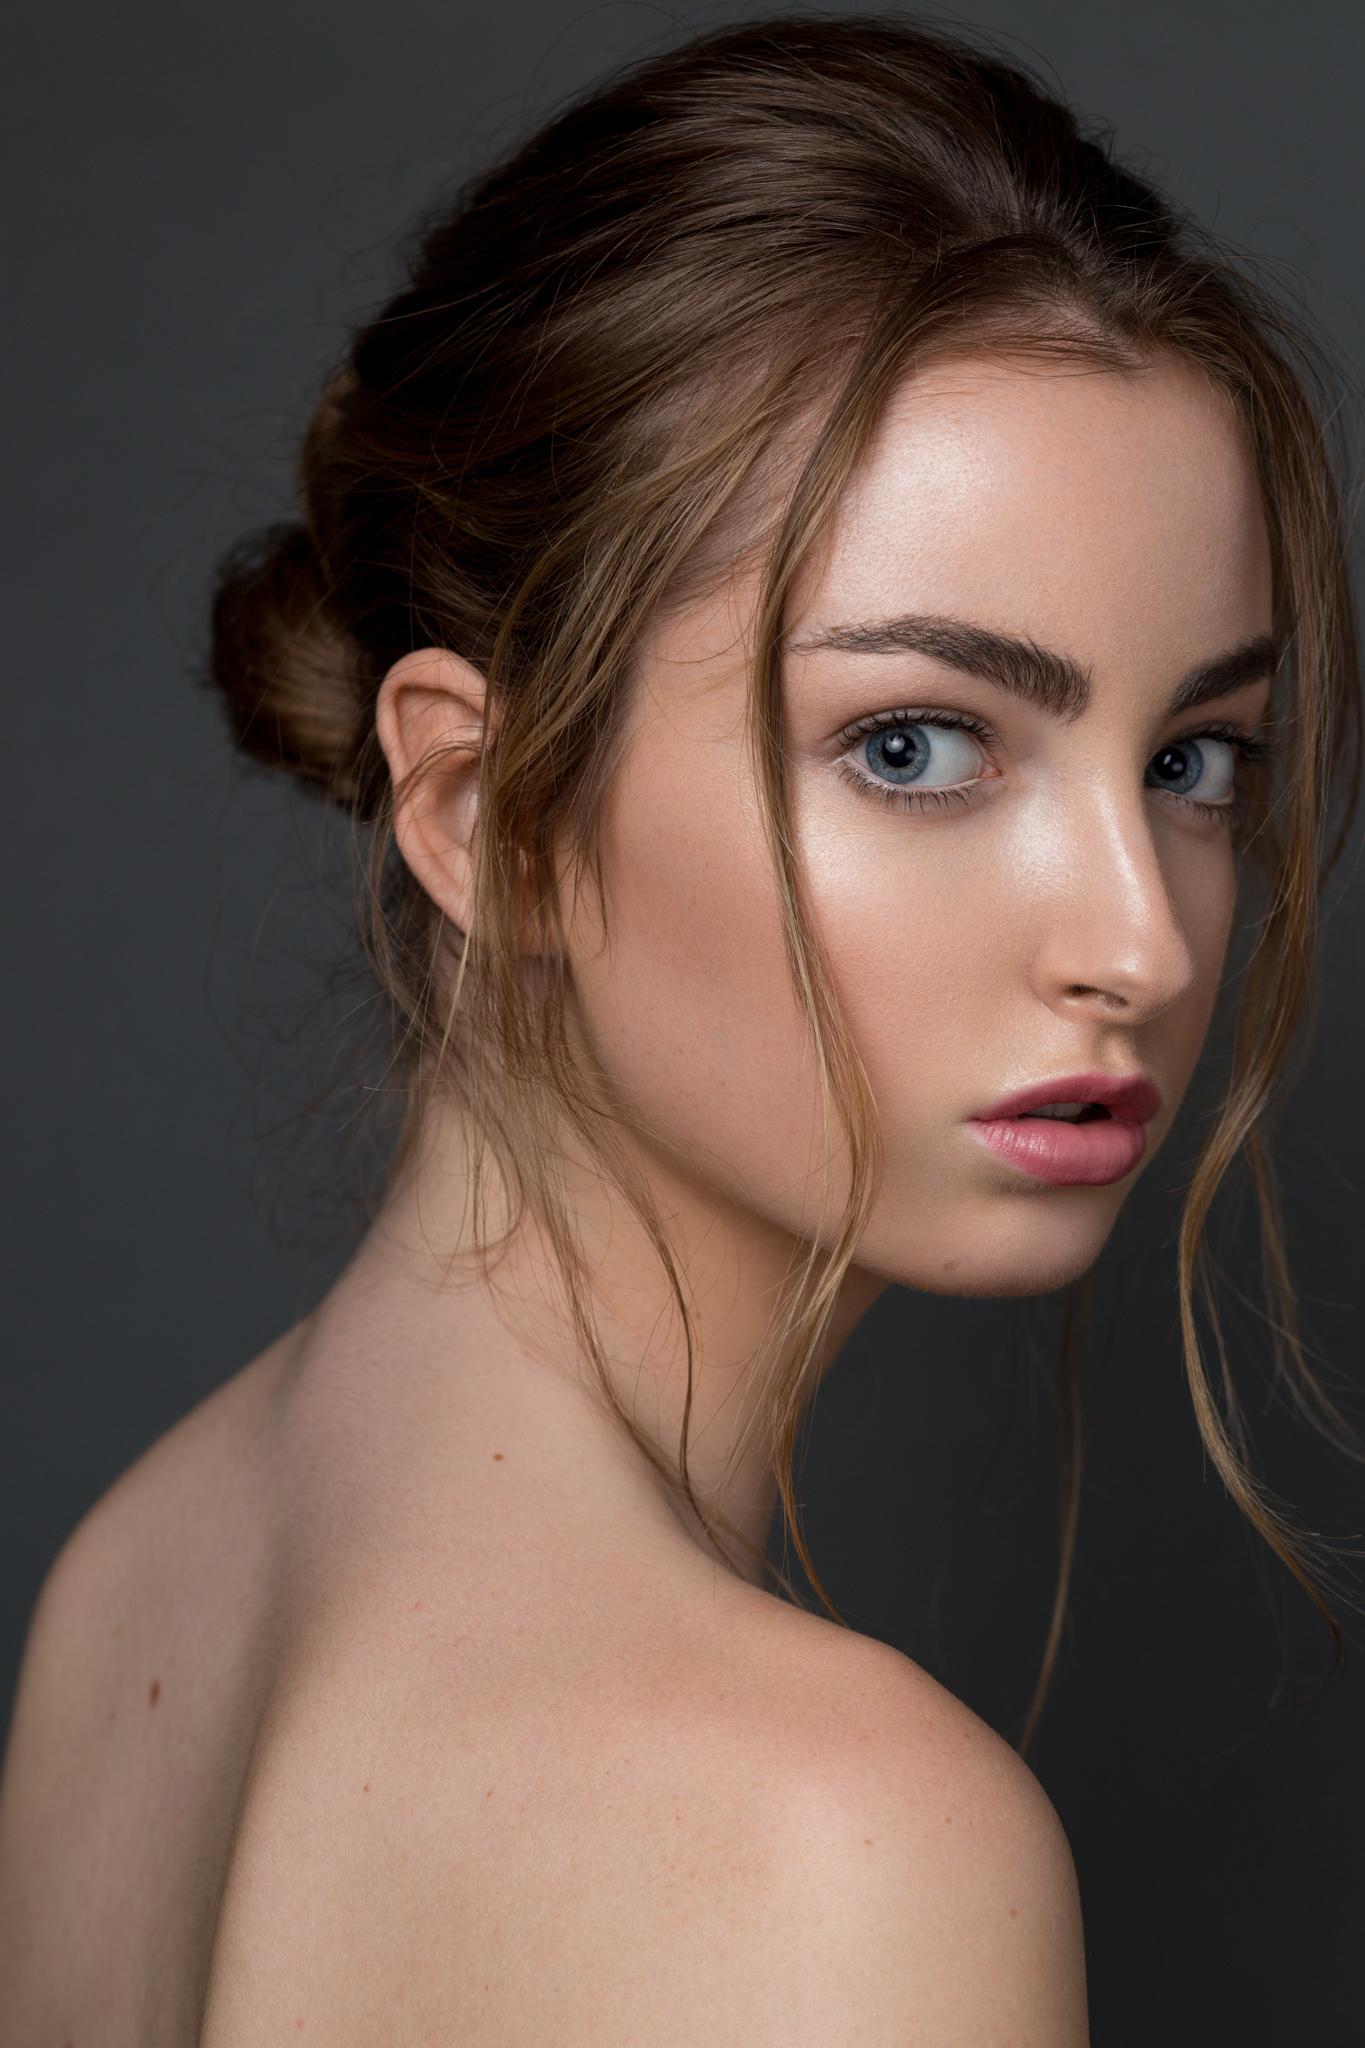 Model: Sophia Lyons of  Scout SF  Hair/Makeup: Maria Ojeda  Camera: Canon EOS 6D Lens: Canon 85mm 1.8 EXIF: 1/250 f/5.6 ISO200 Lighting: Godox V850 II + Godox 95cm Octabox on camera left above model, Godox V850 II + 120cm Octabox on camera right behind camera